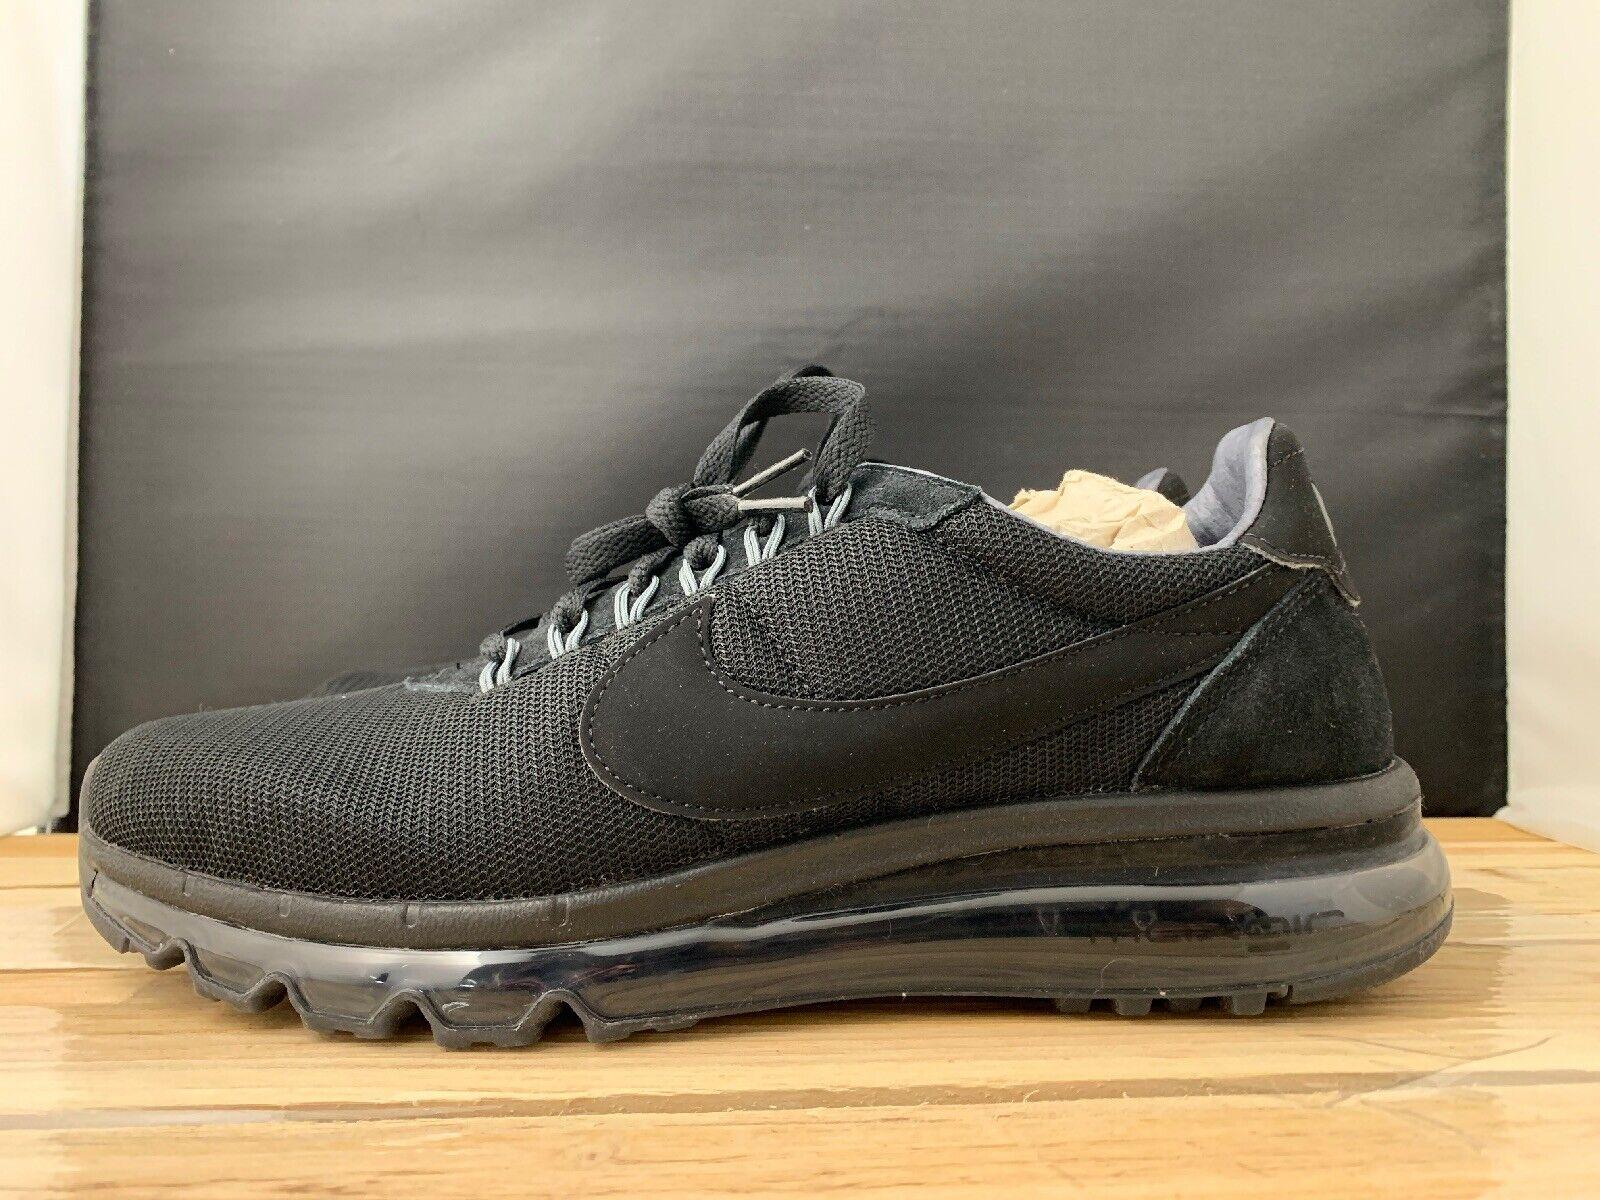 acd51b877c Men's Nike Air Max LD-ZERO Black Dark Grey 848624-005 Running shoes Size